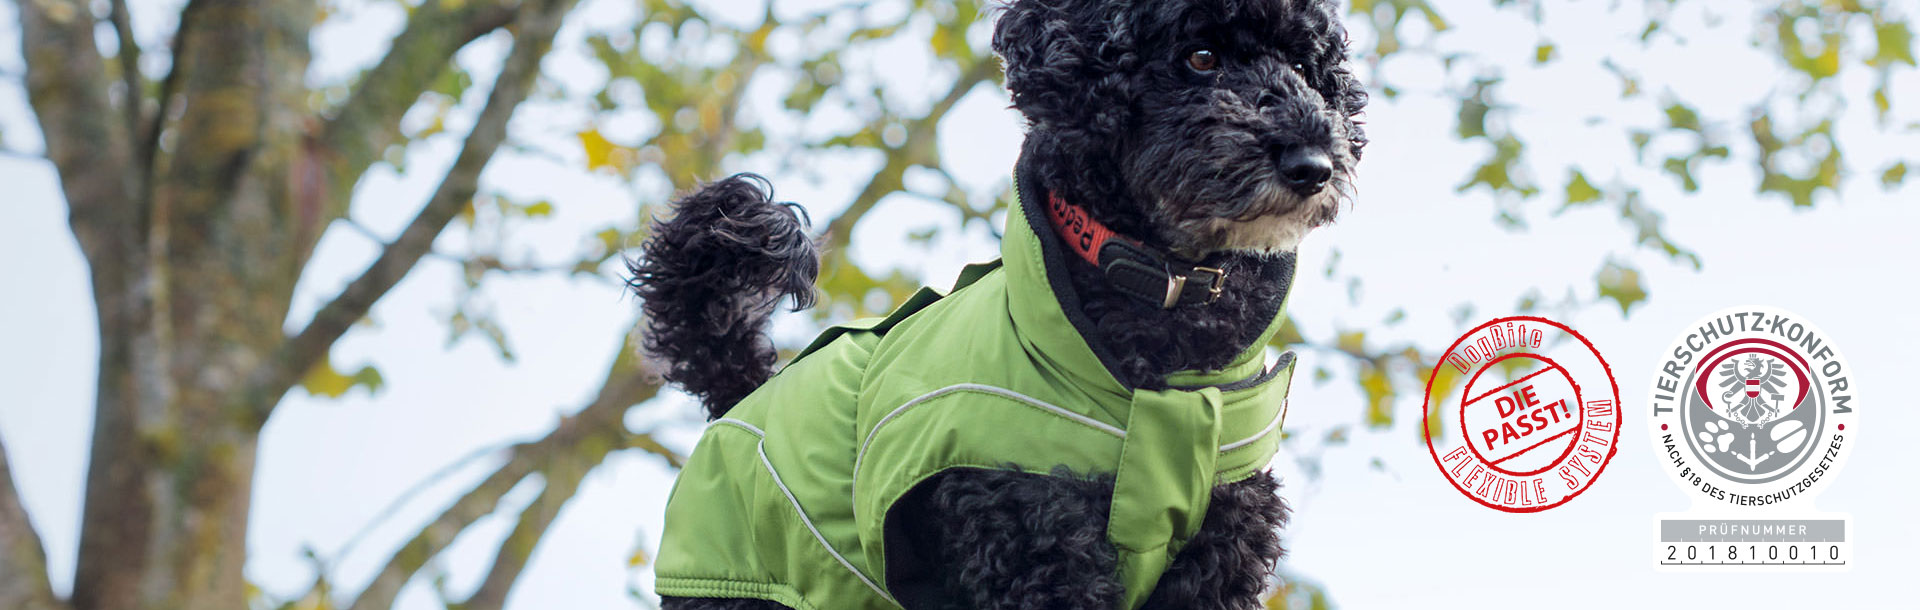 DogBite Hundejacken, Bild 1